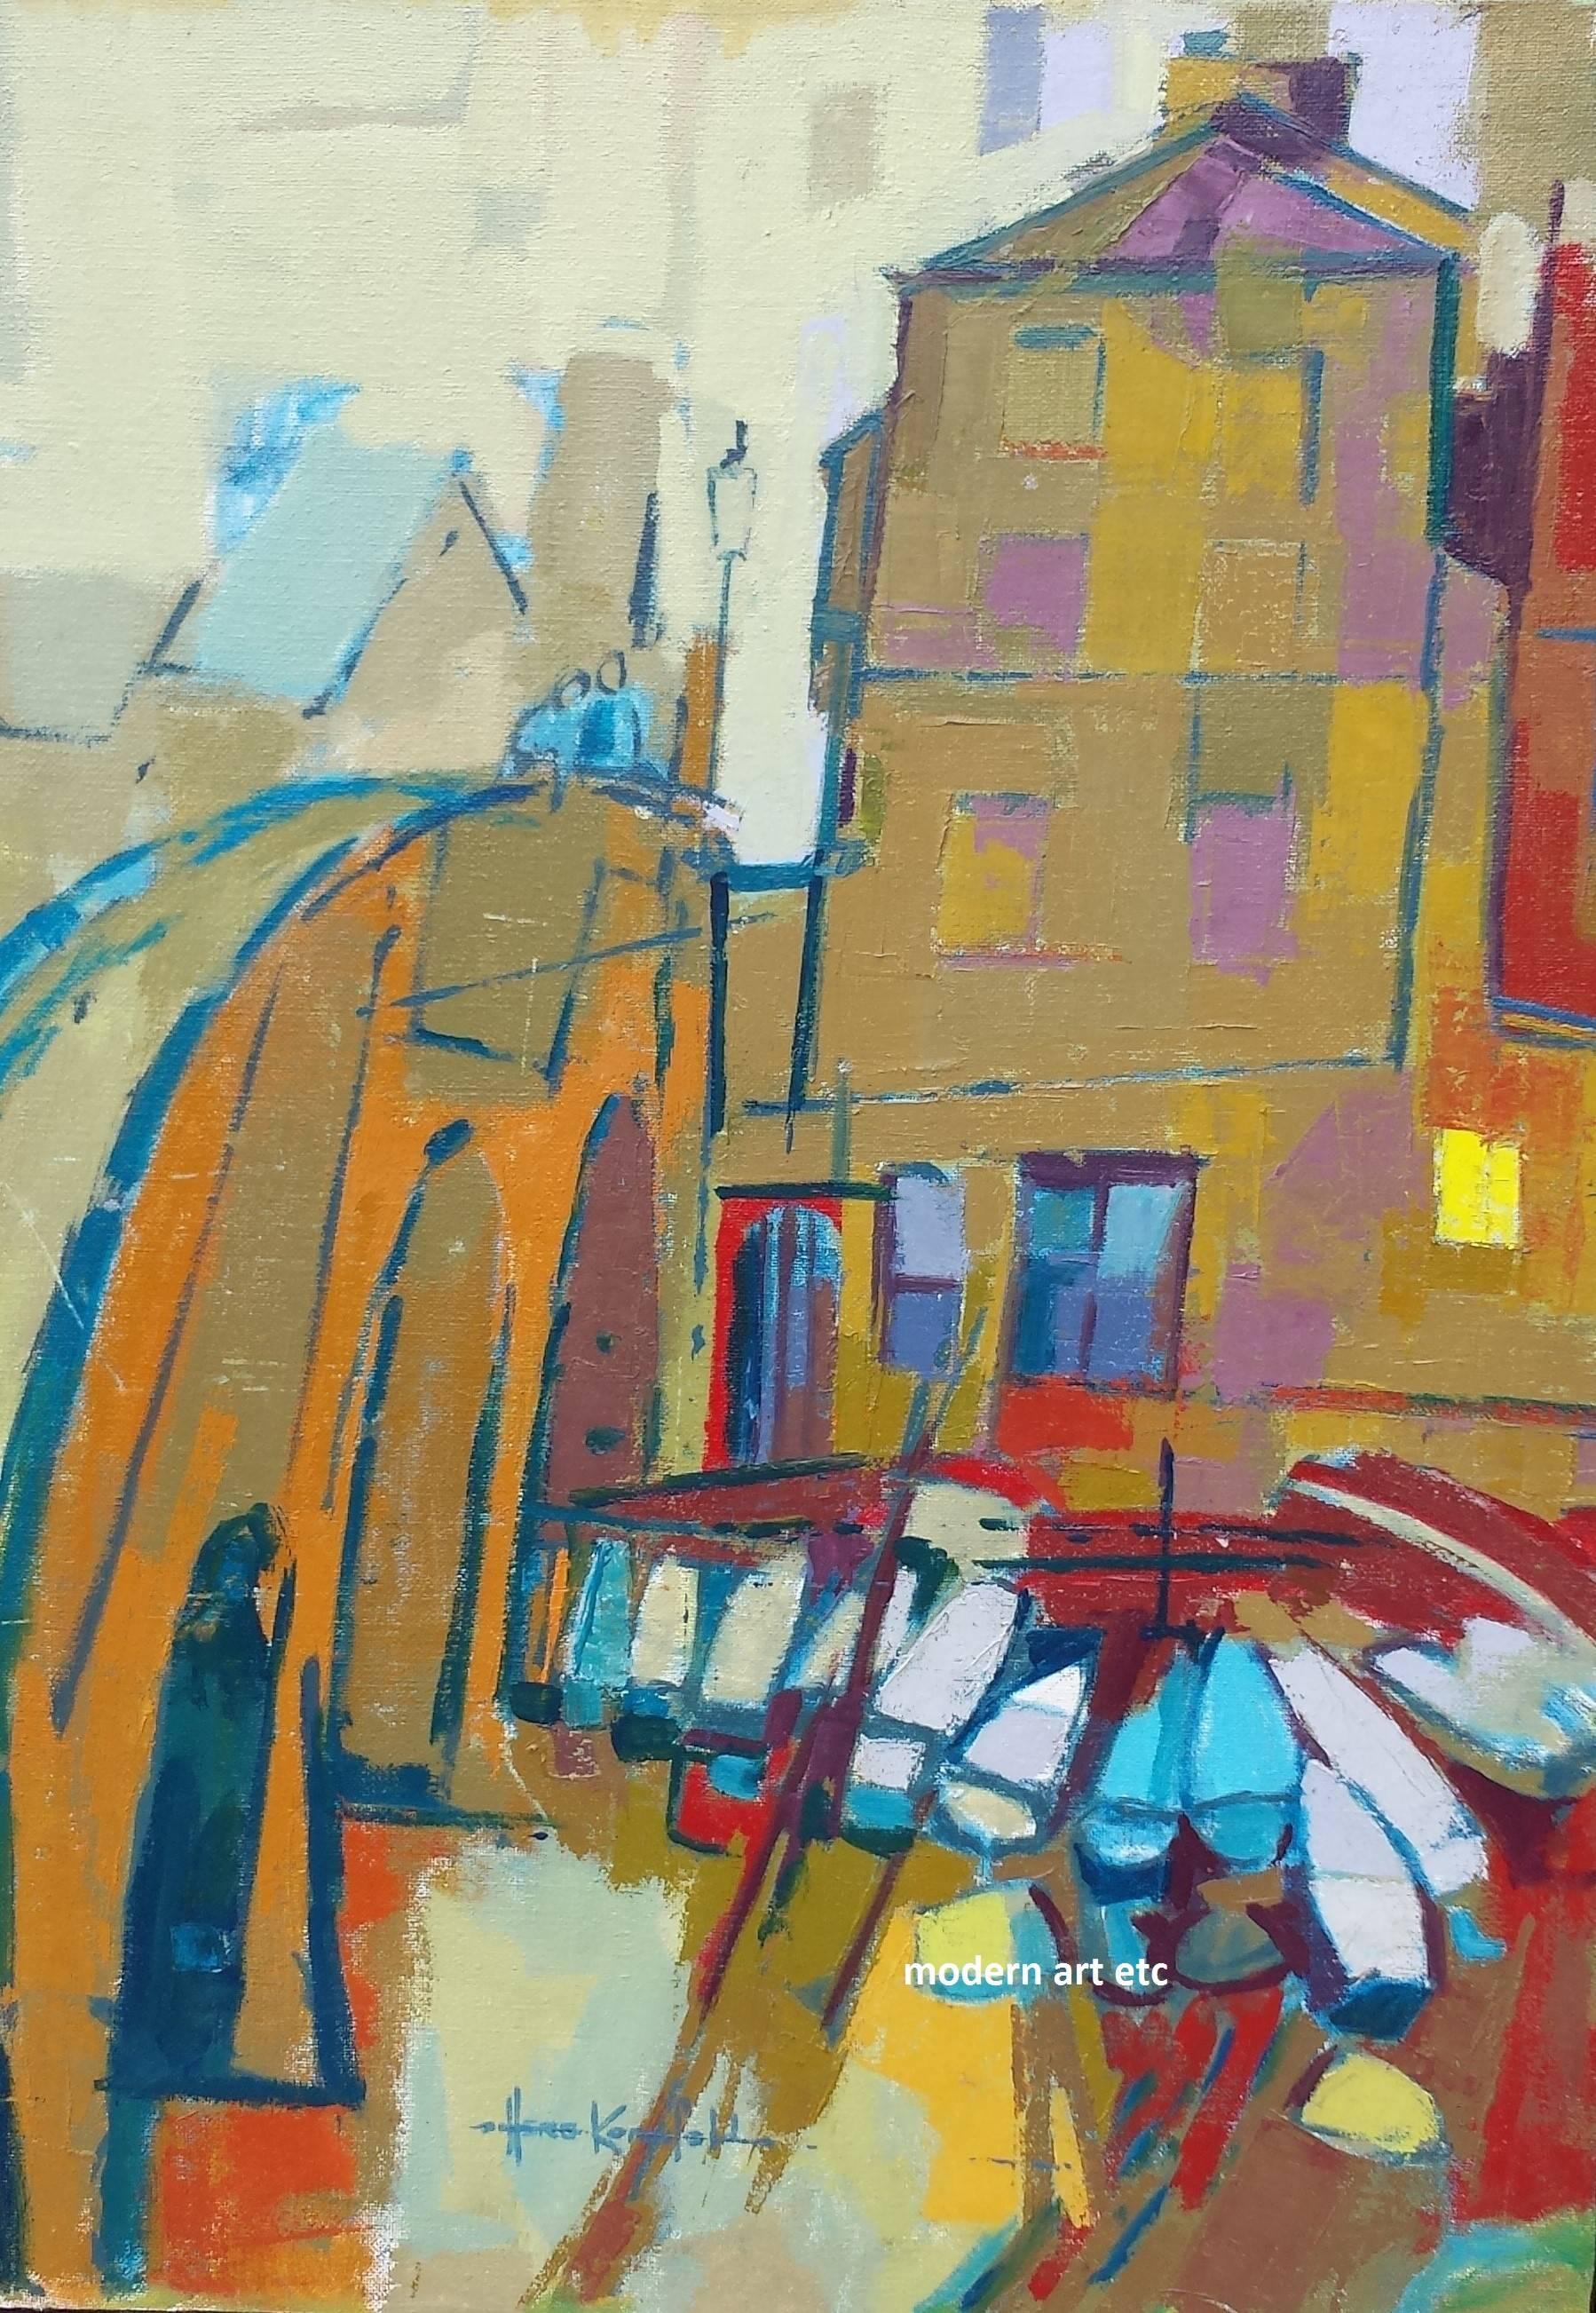 Oil on Canvas - #1100 Rental Boat by Bridge, Oxford, England